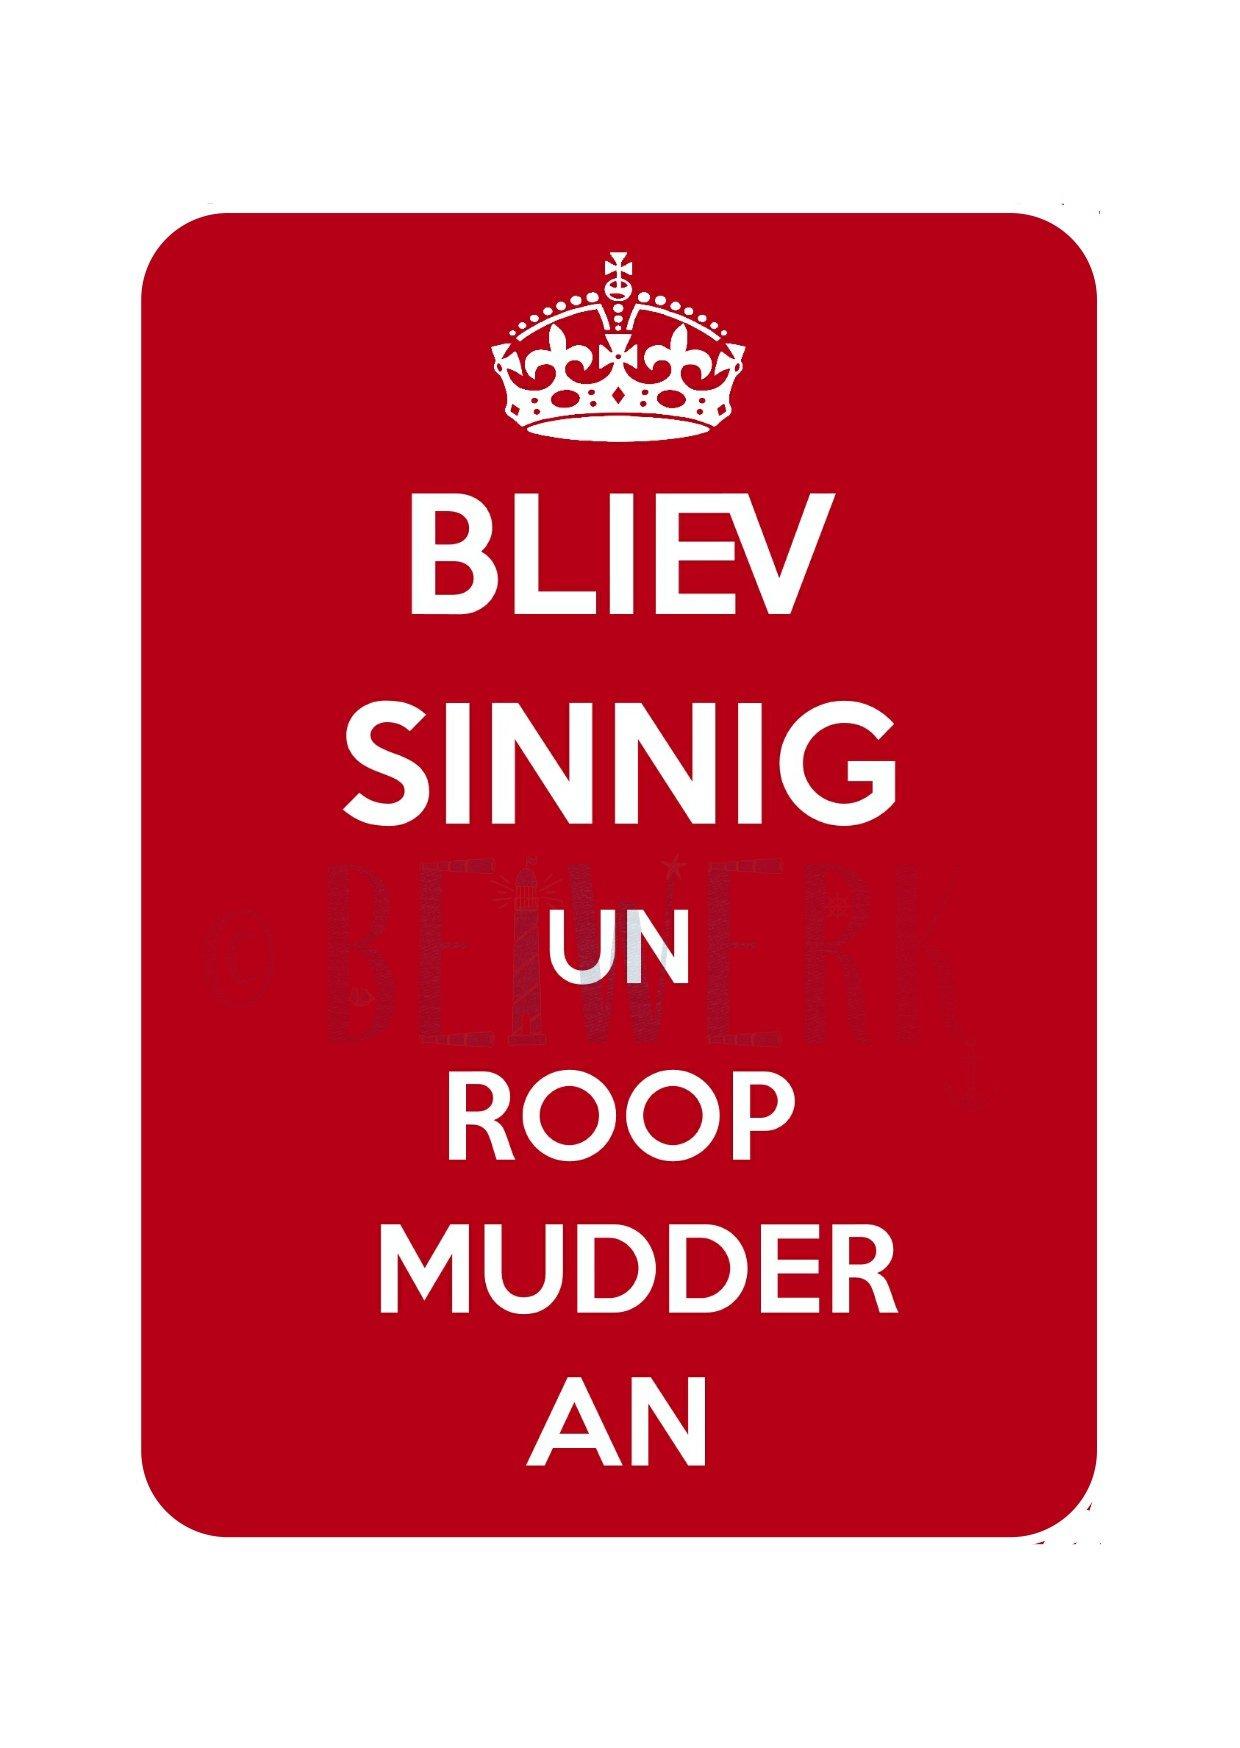 Postkarte Bliev sinnig un roop Mudder an - 1